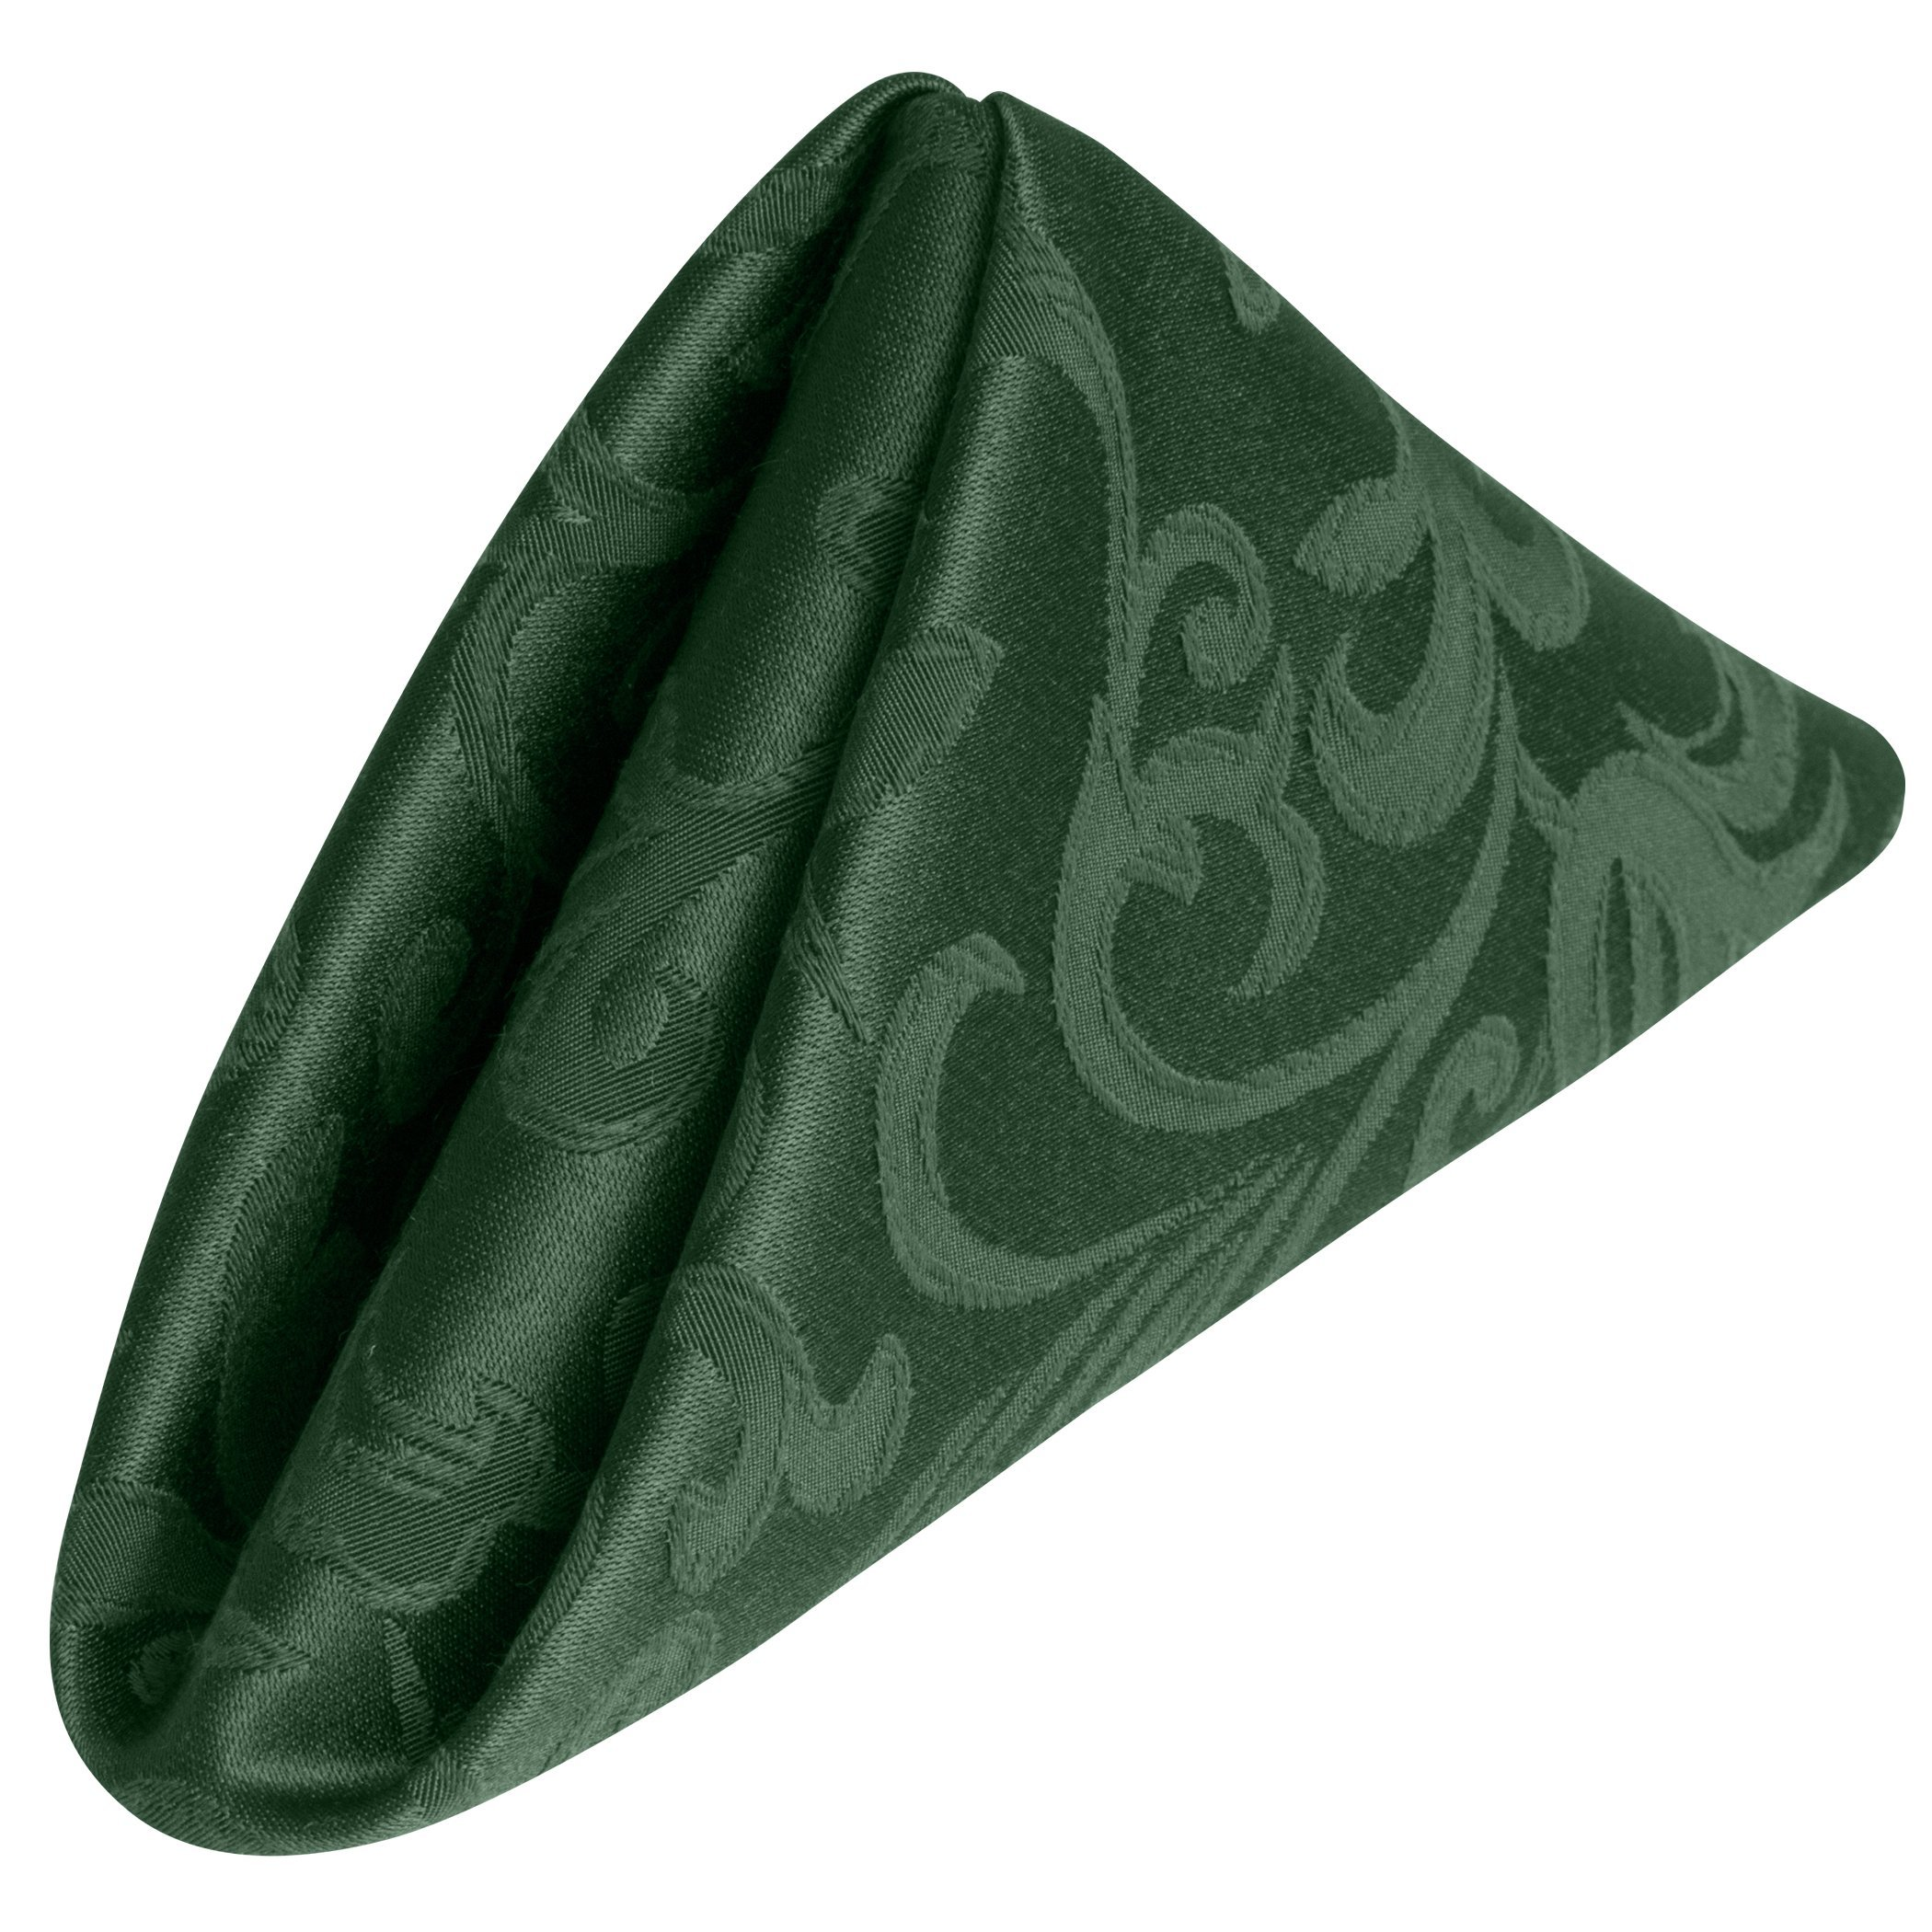 Ultimate Textile (5 Dozen) Somerset 20 x 20-Inch Damask Cloth Dinner Napkins- Jacquard Weave Scroll Design, Hunter Green